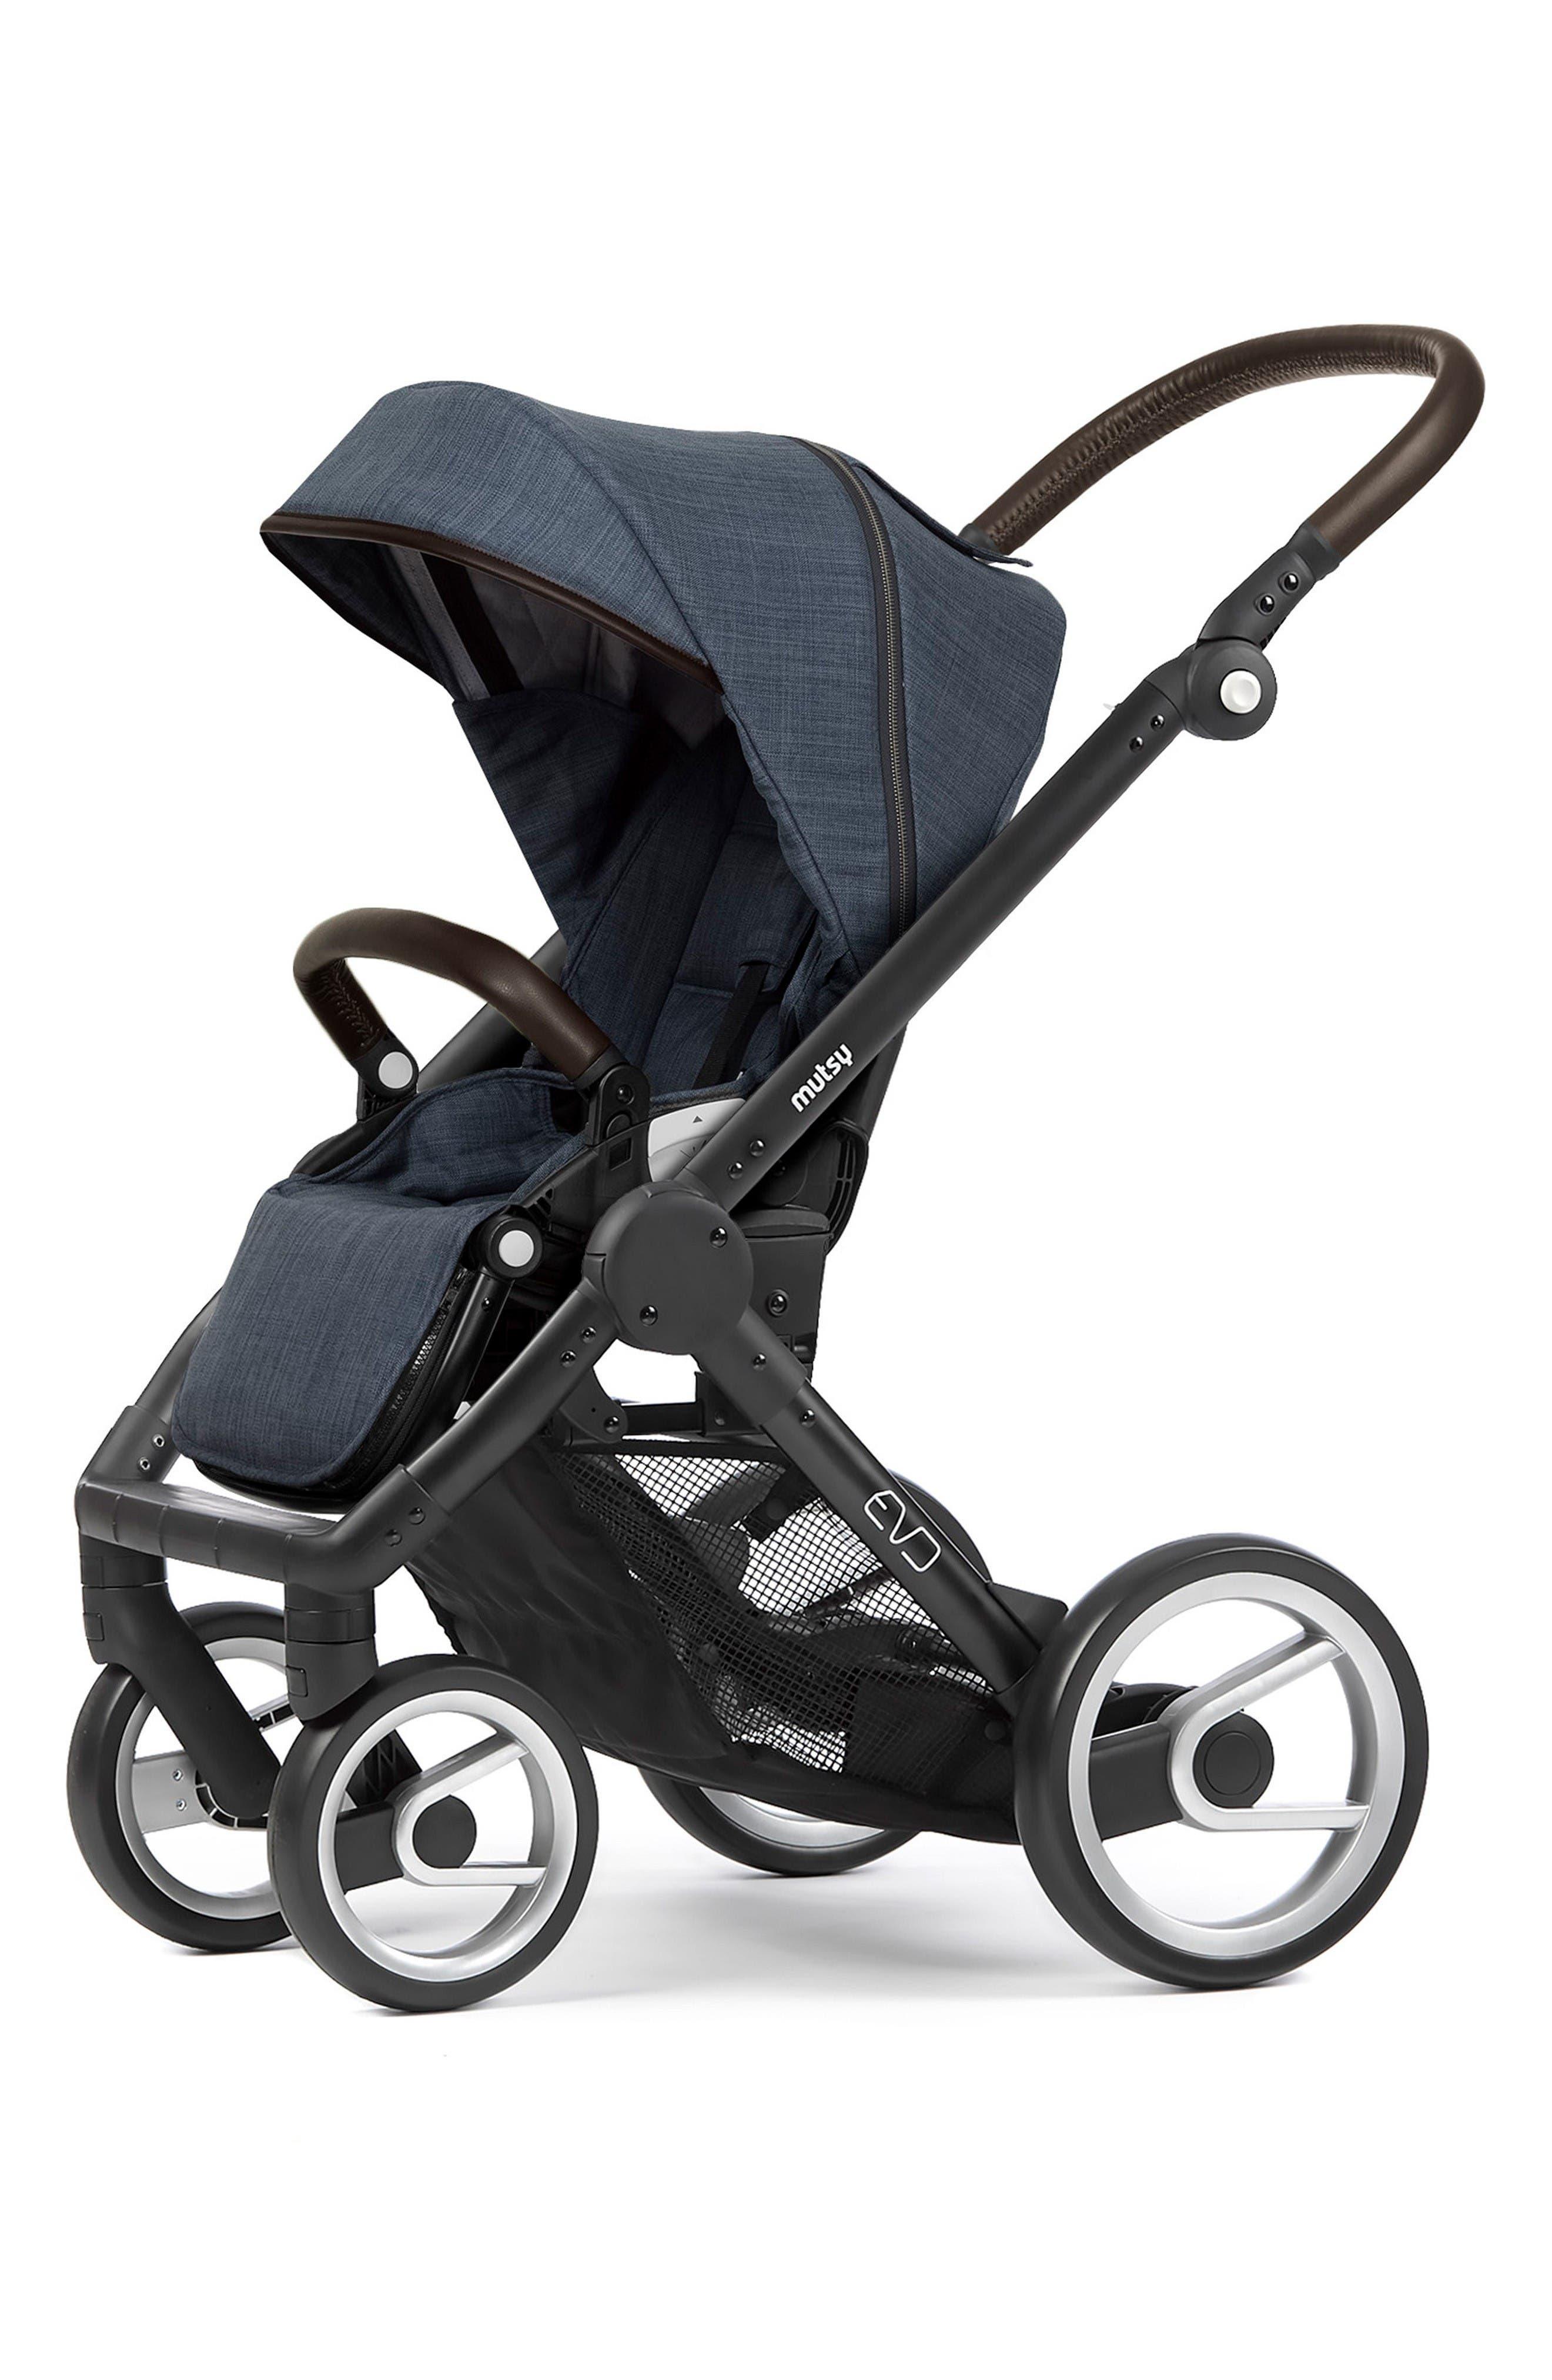 Evo - Farmer Earth Stroller,                             Main thumbnail 1, color,                             Black/ Blue